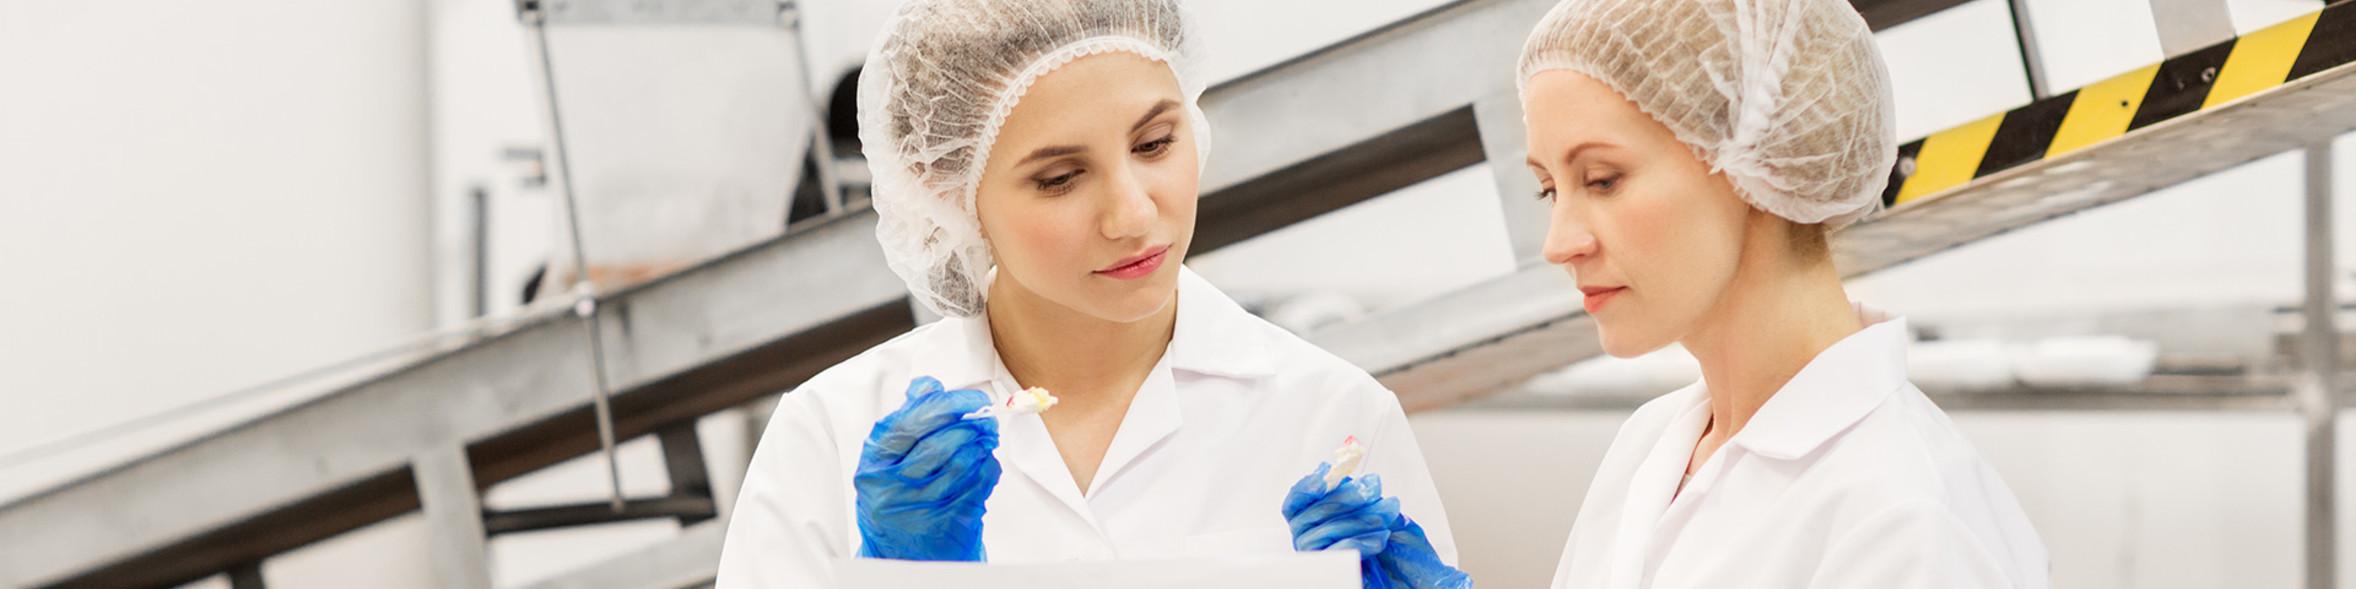 Meier Verpackungen, Hygiene, Hygienprodukte, Arbeitsschutz, Arbeitsschutzprodukte, Wischen & Waschen